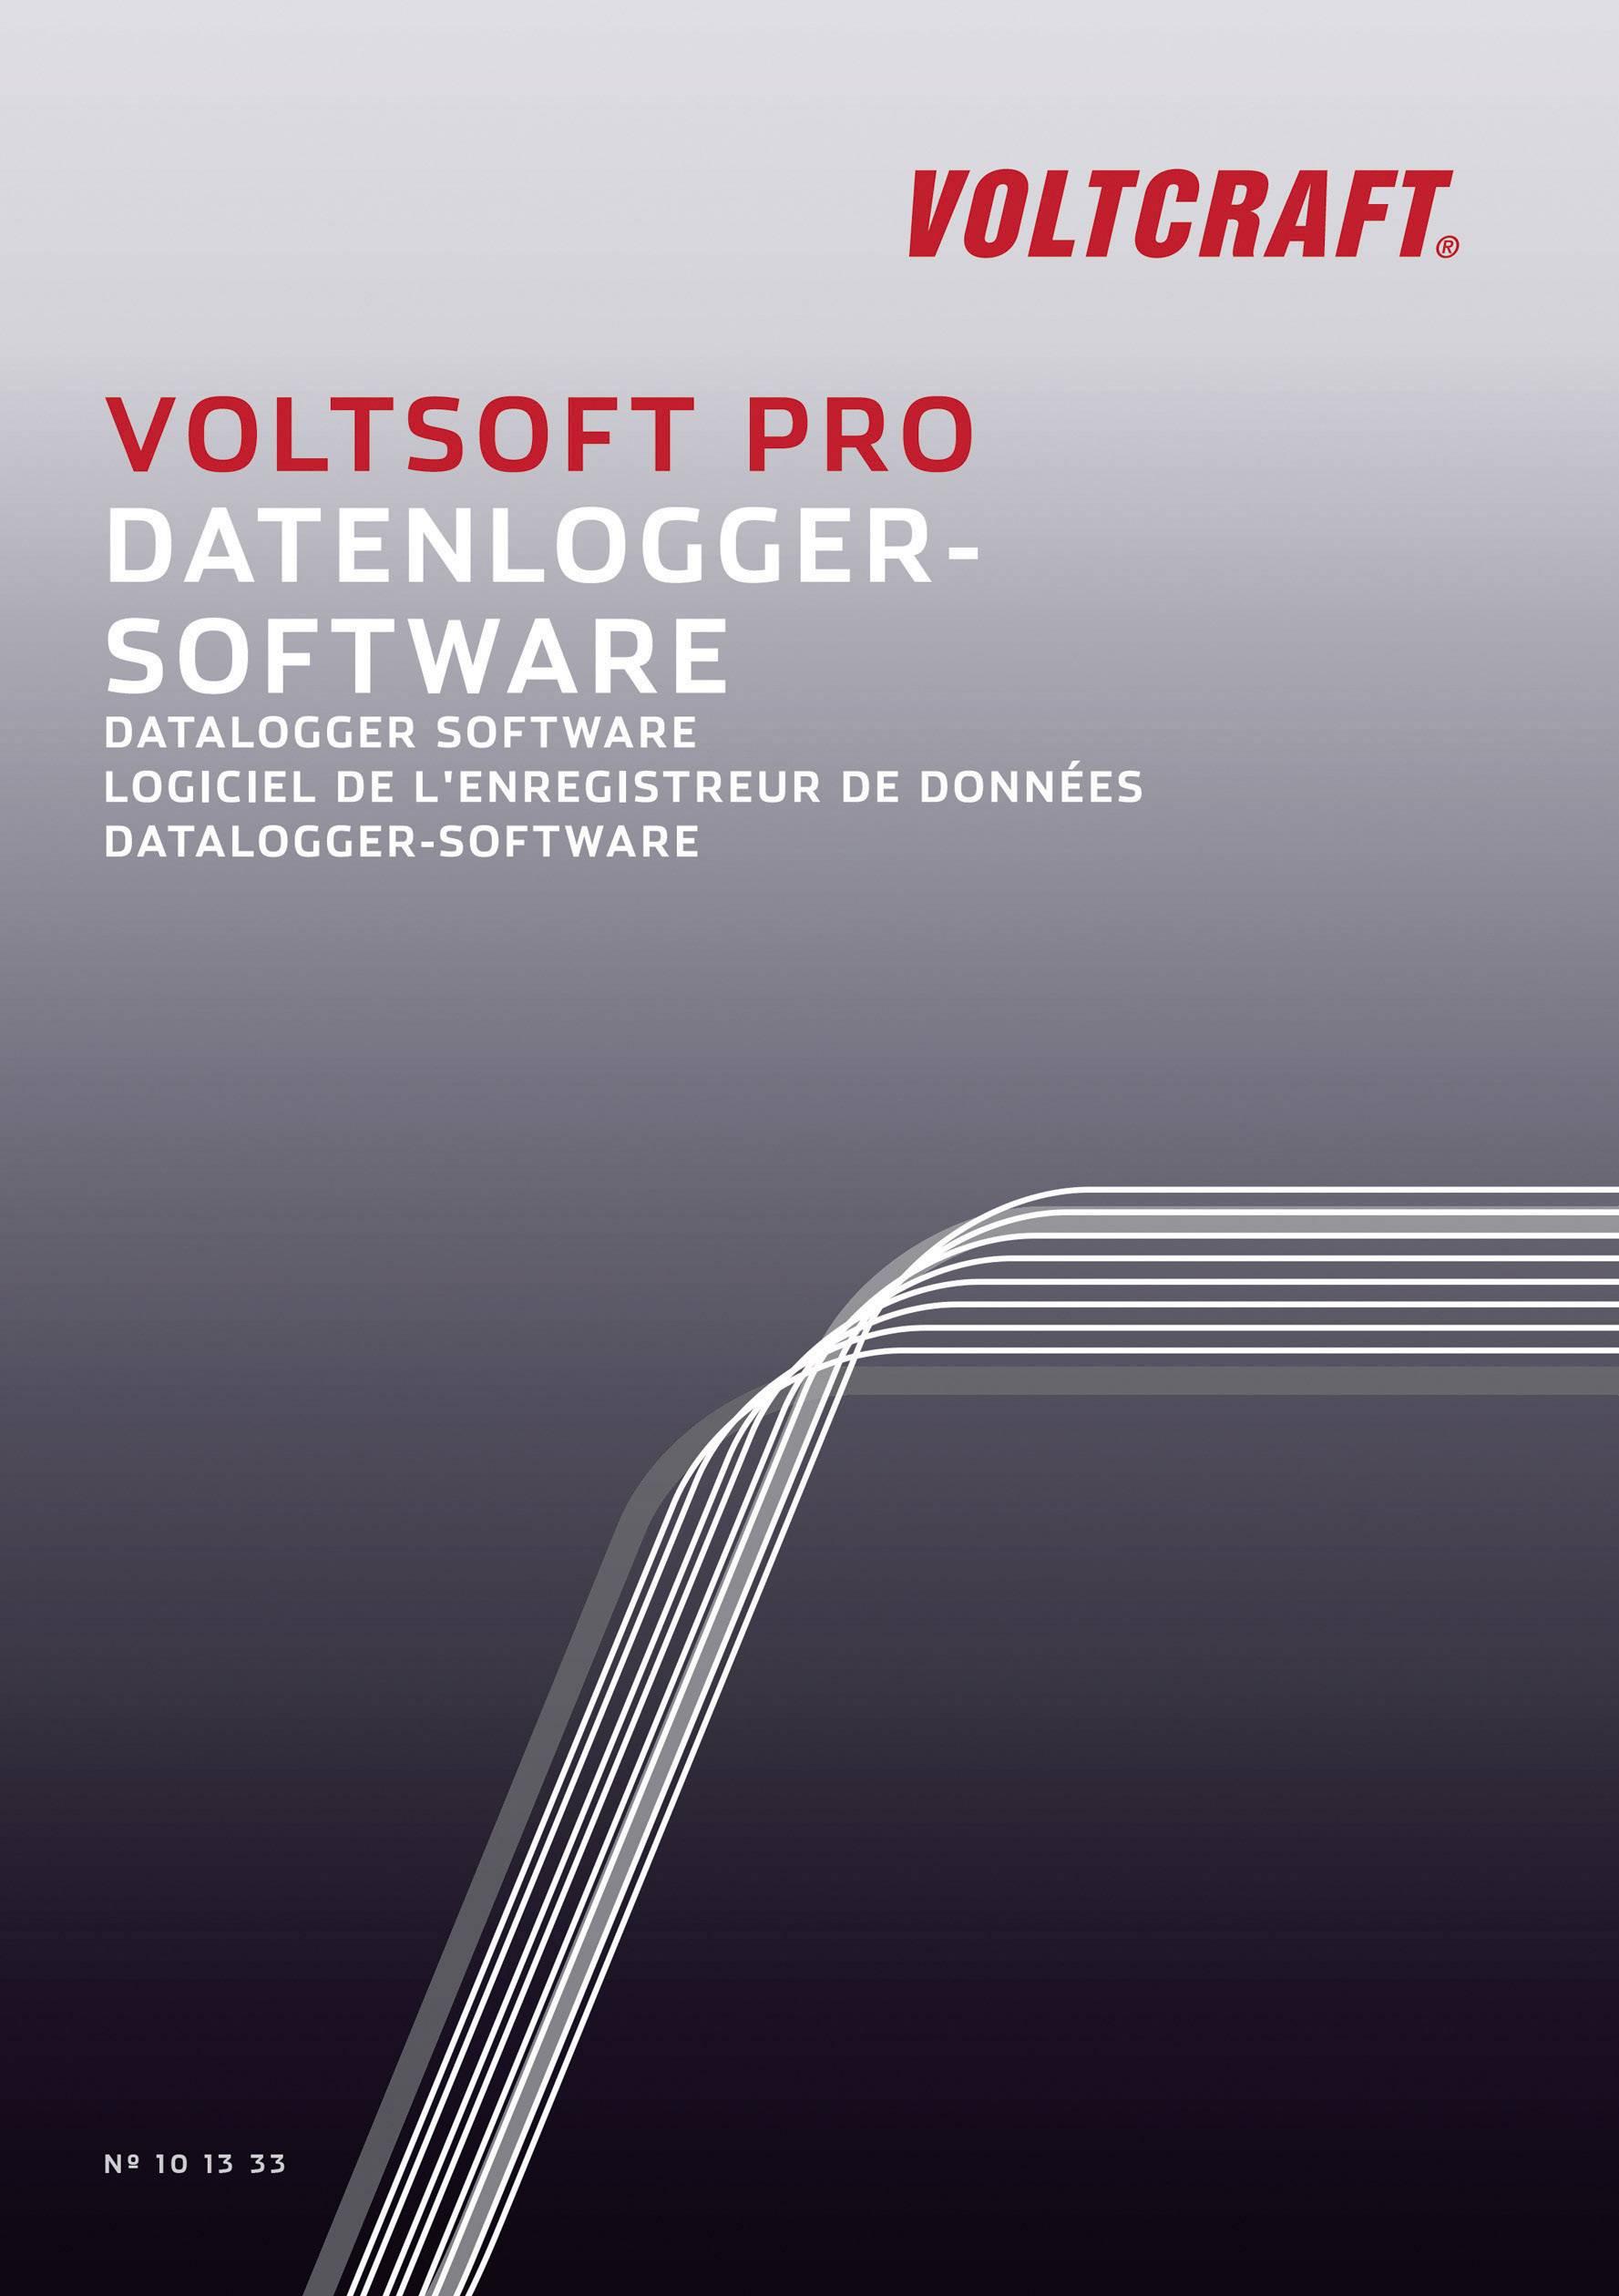 Software Voltcraft VoltSoft PRO, pro datalogger